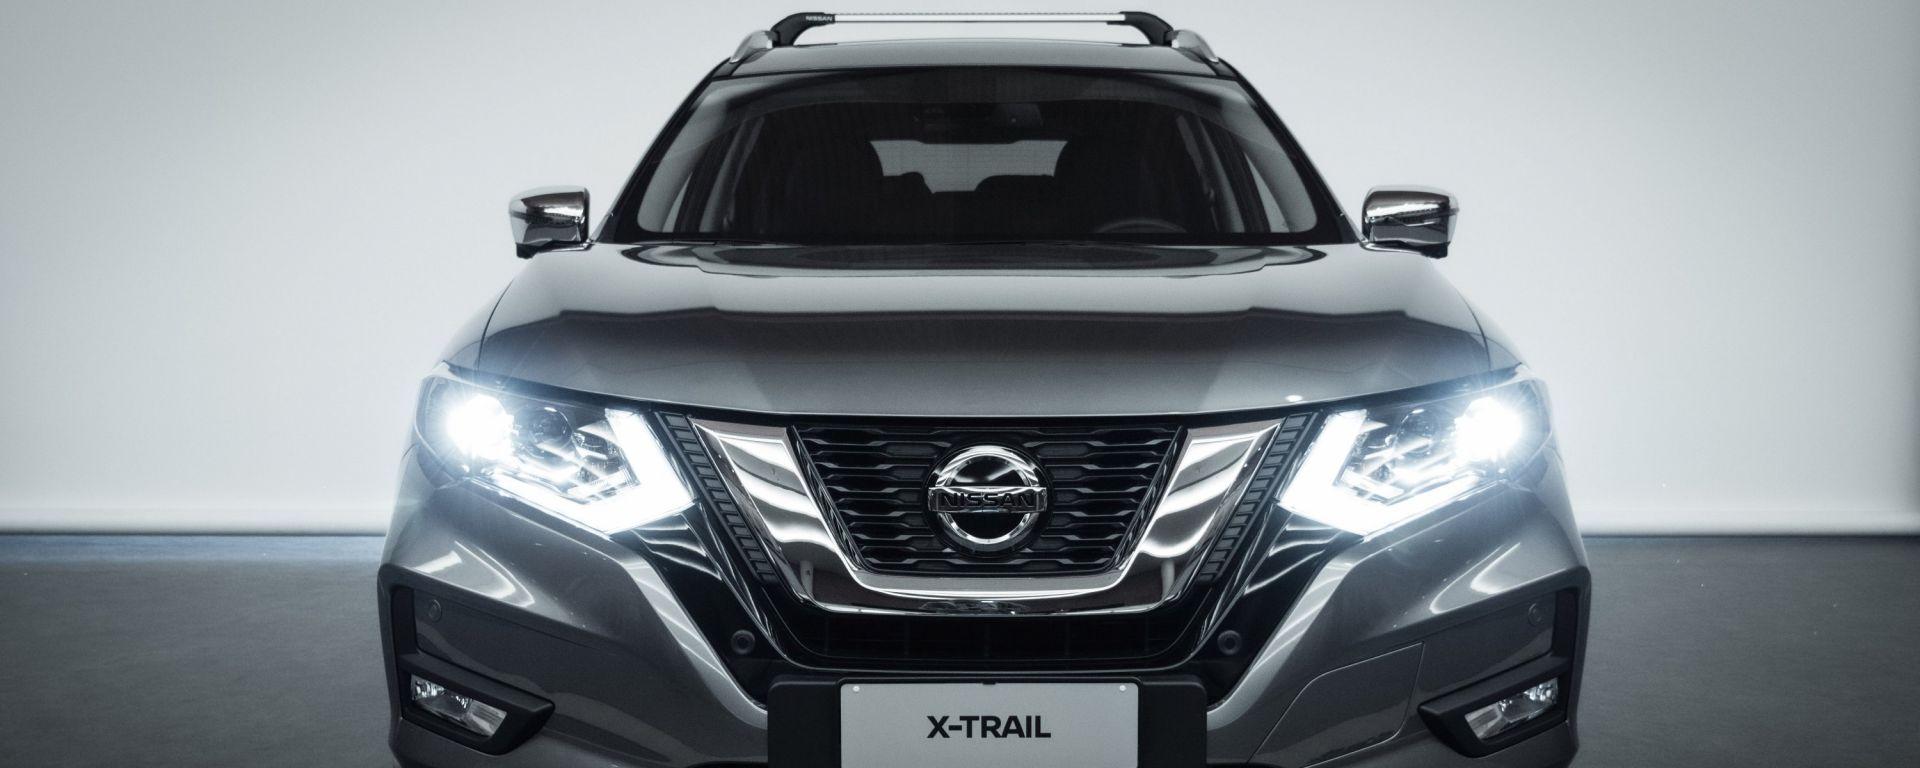 Nissan X-Trail Salomon: visuale frontale